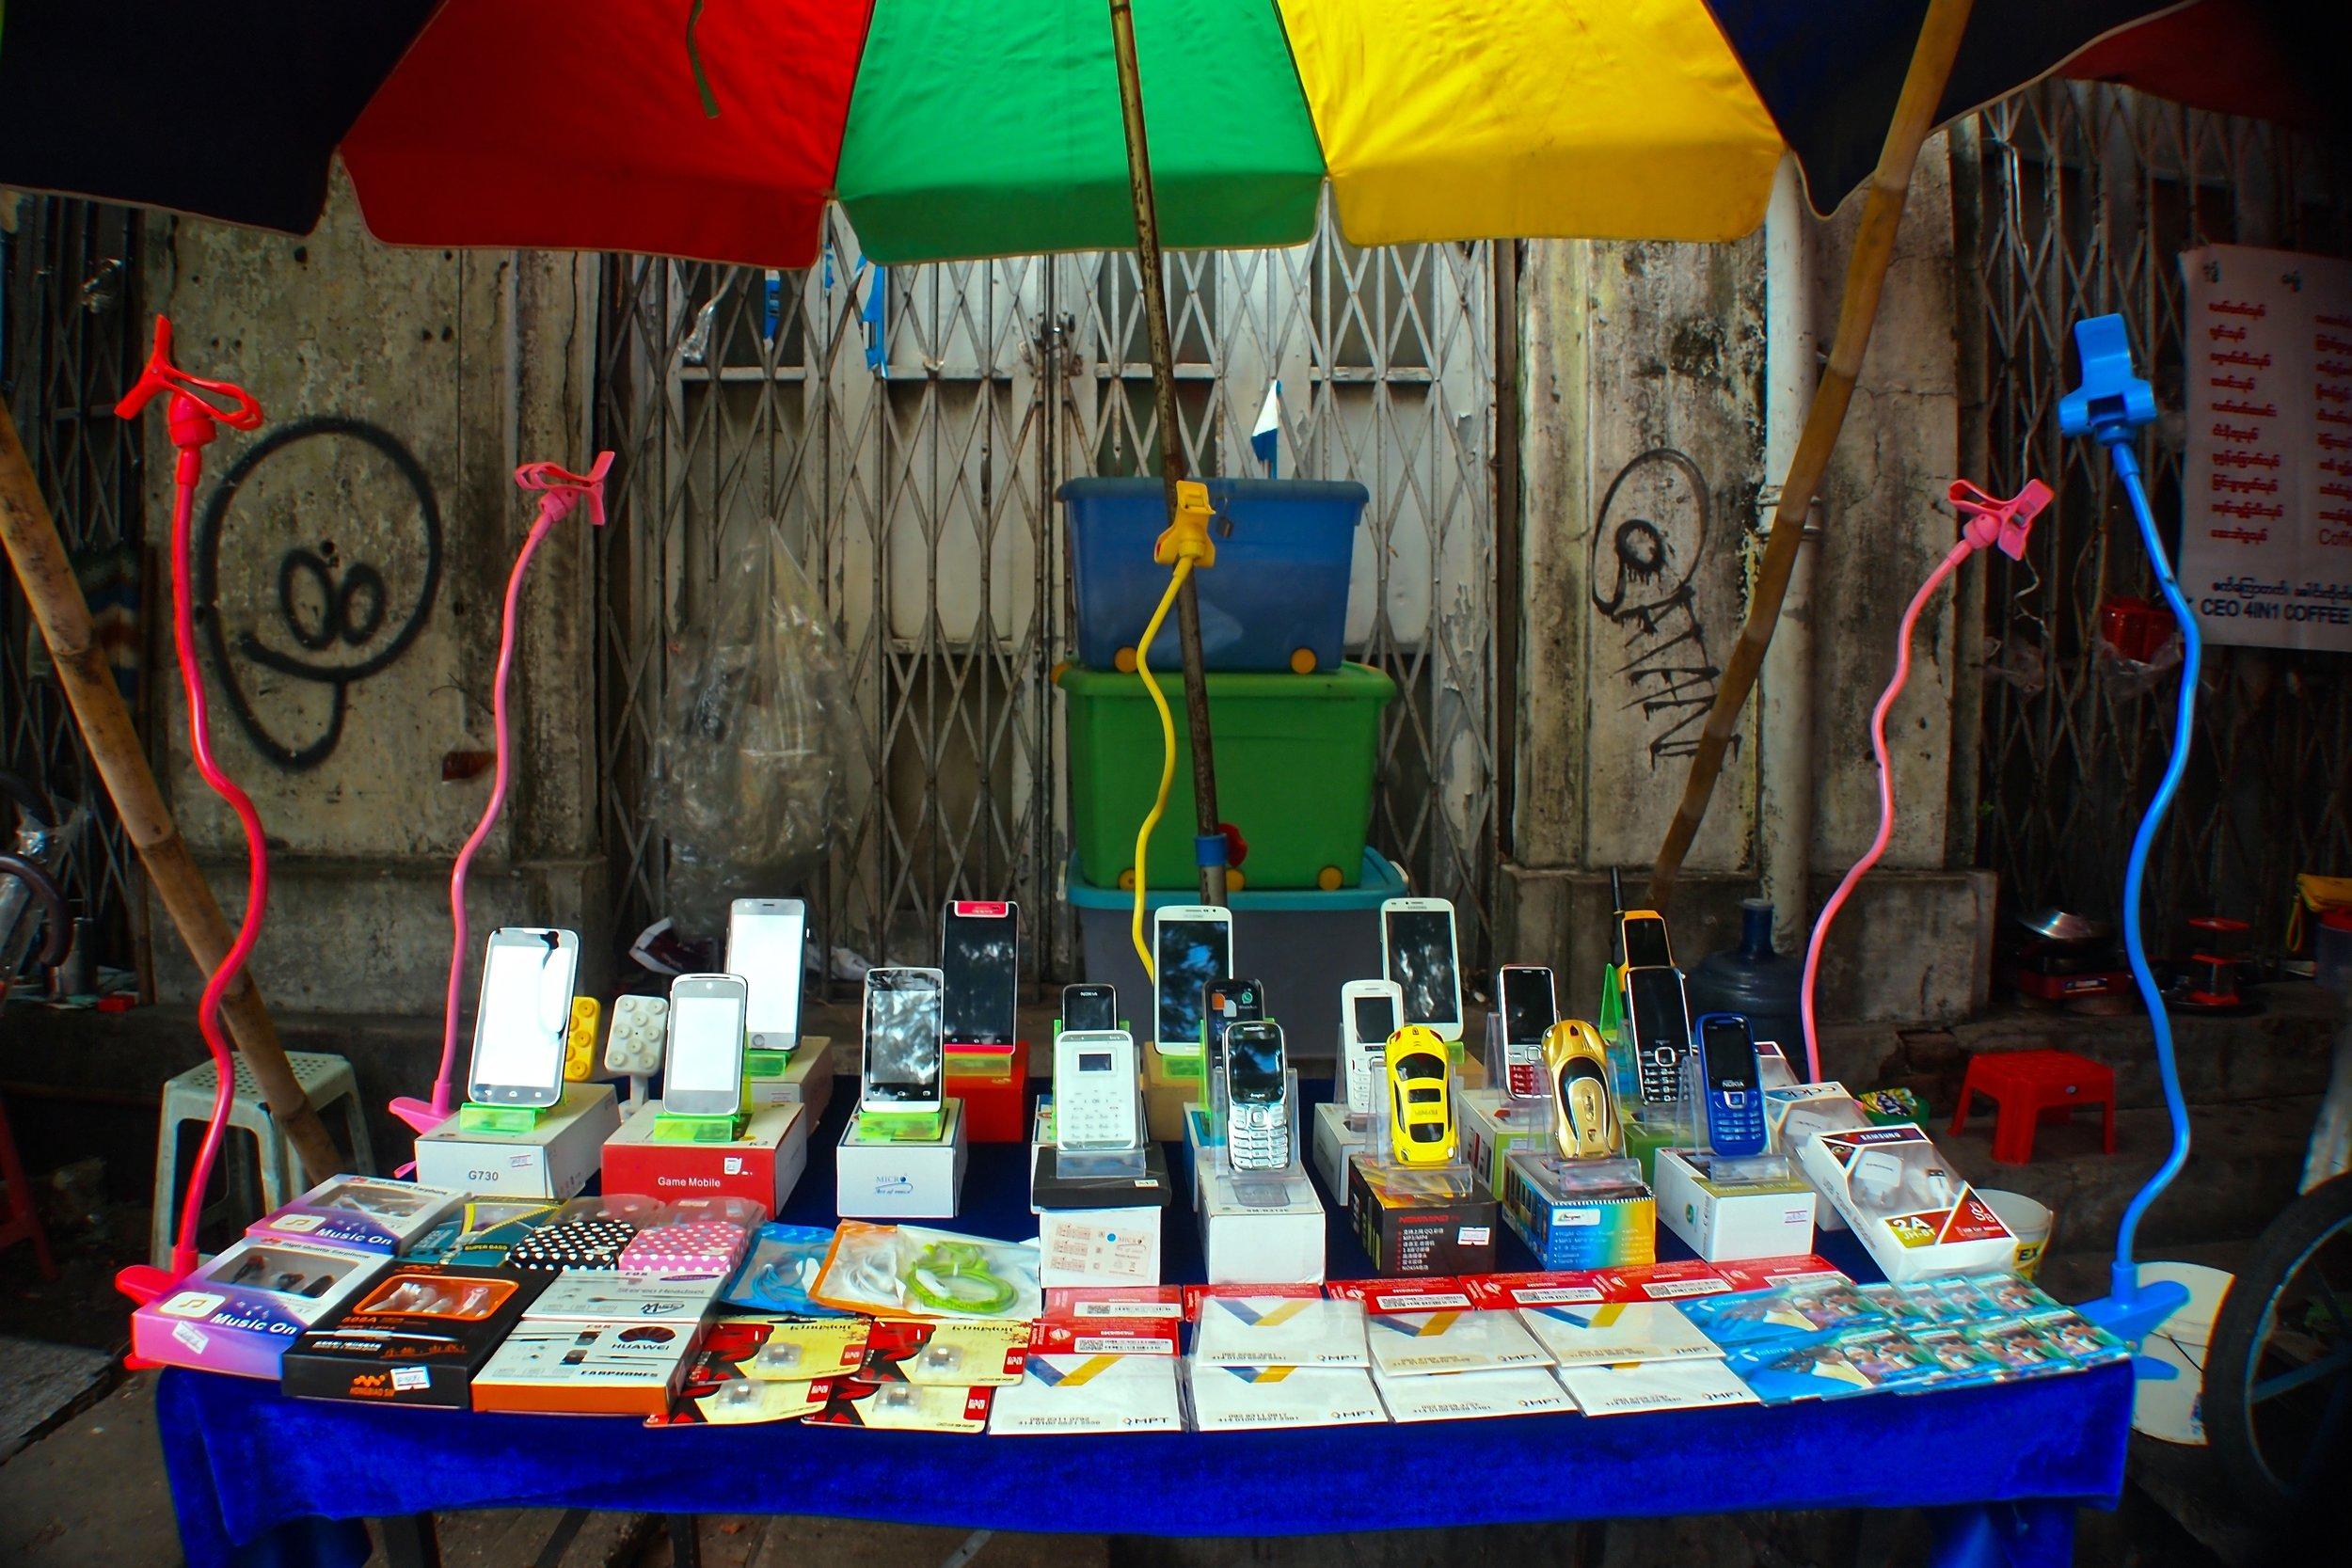 Street stall selling mobile phones and SIM-cards in Yangon, Myanmar. (C) Remko Tanis